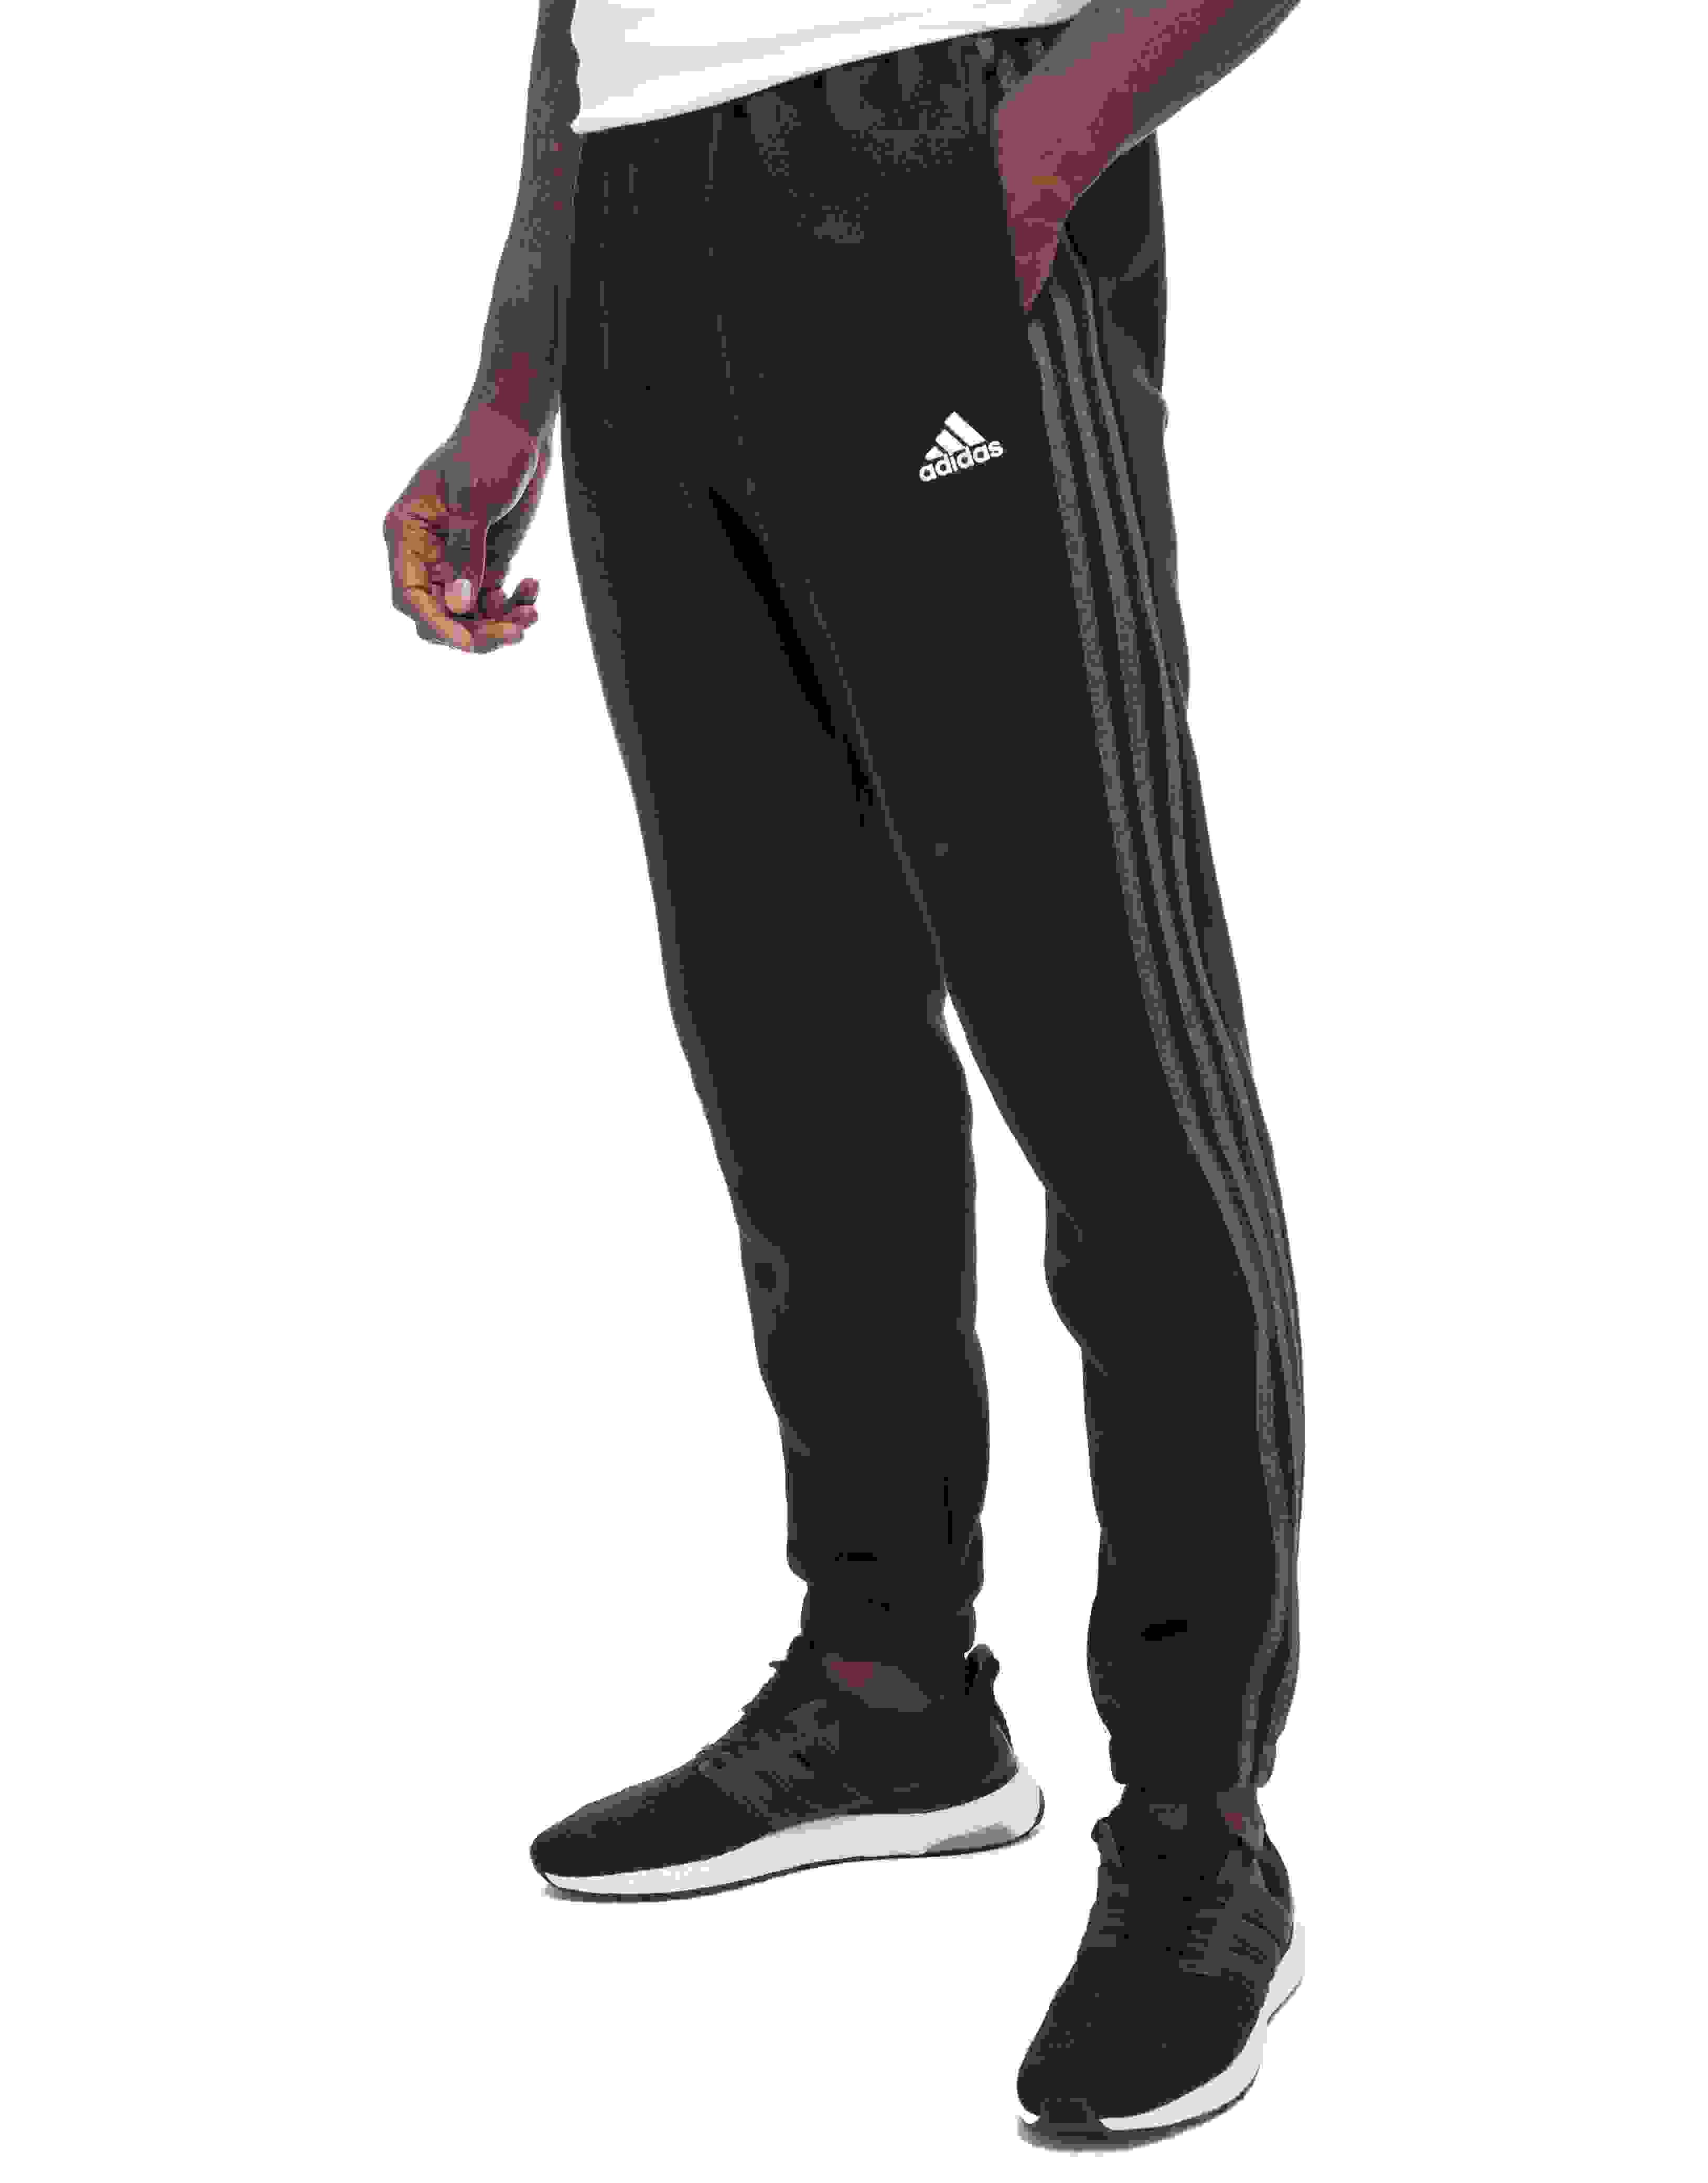 adidas 3 stripe pants. adidas 3-stripes essential track pants 3 stripe a